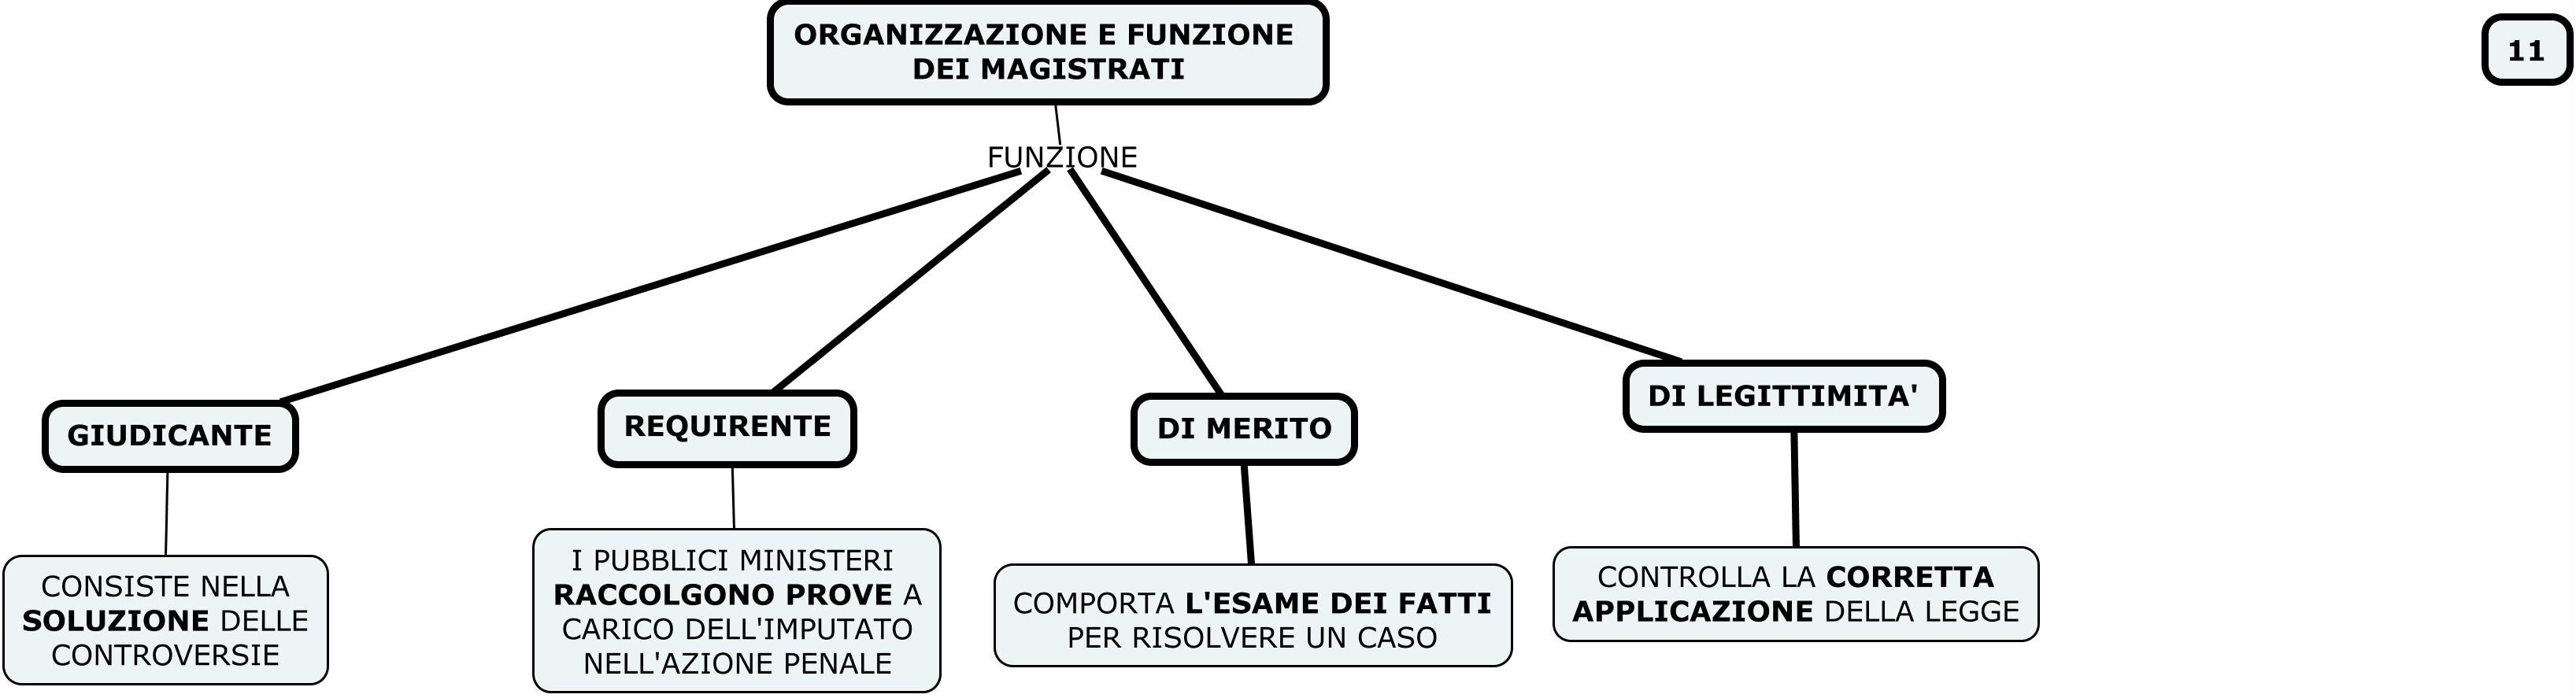 MAPPA 11